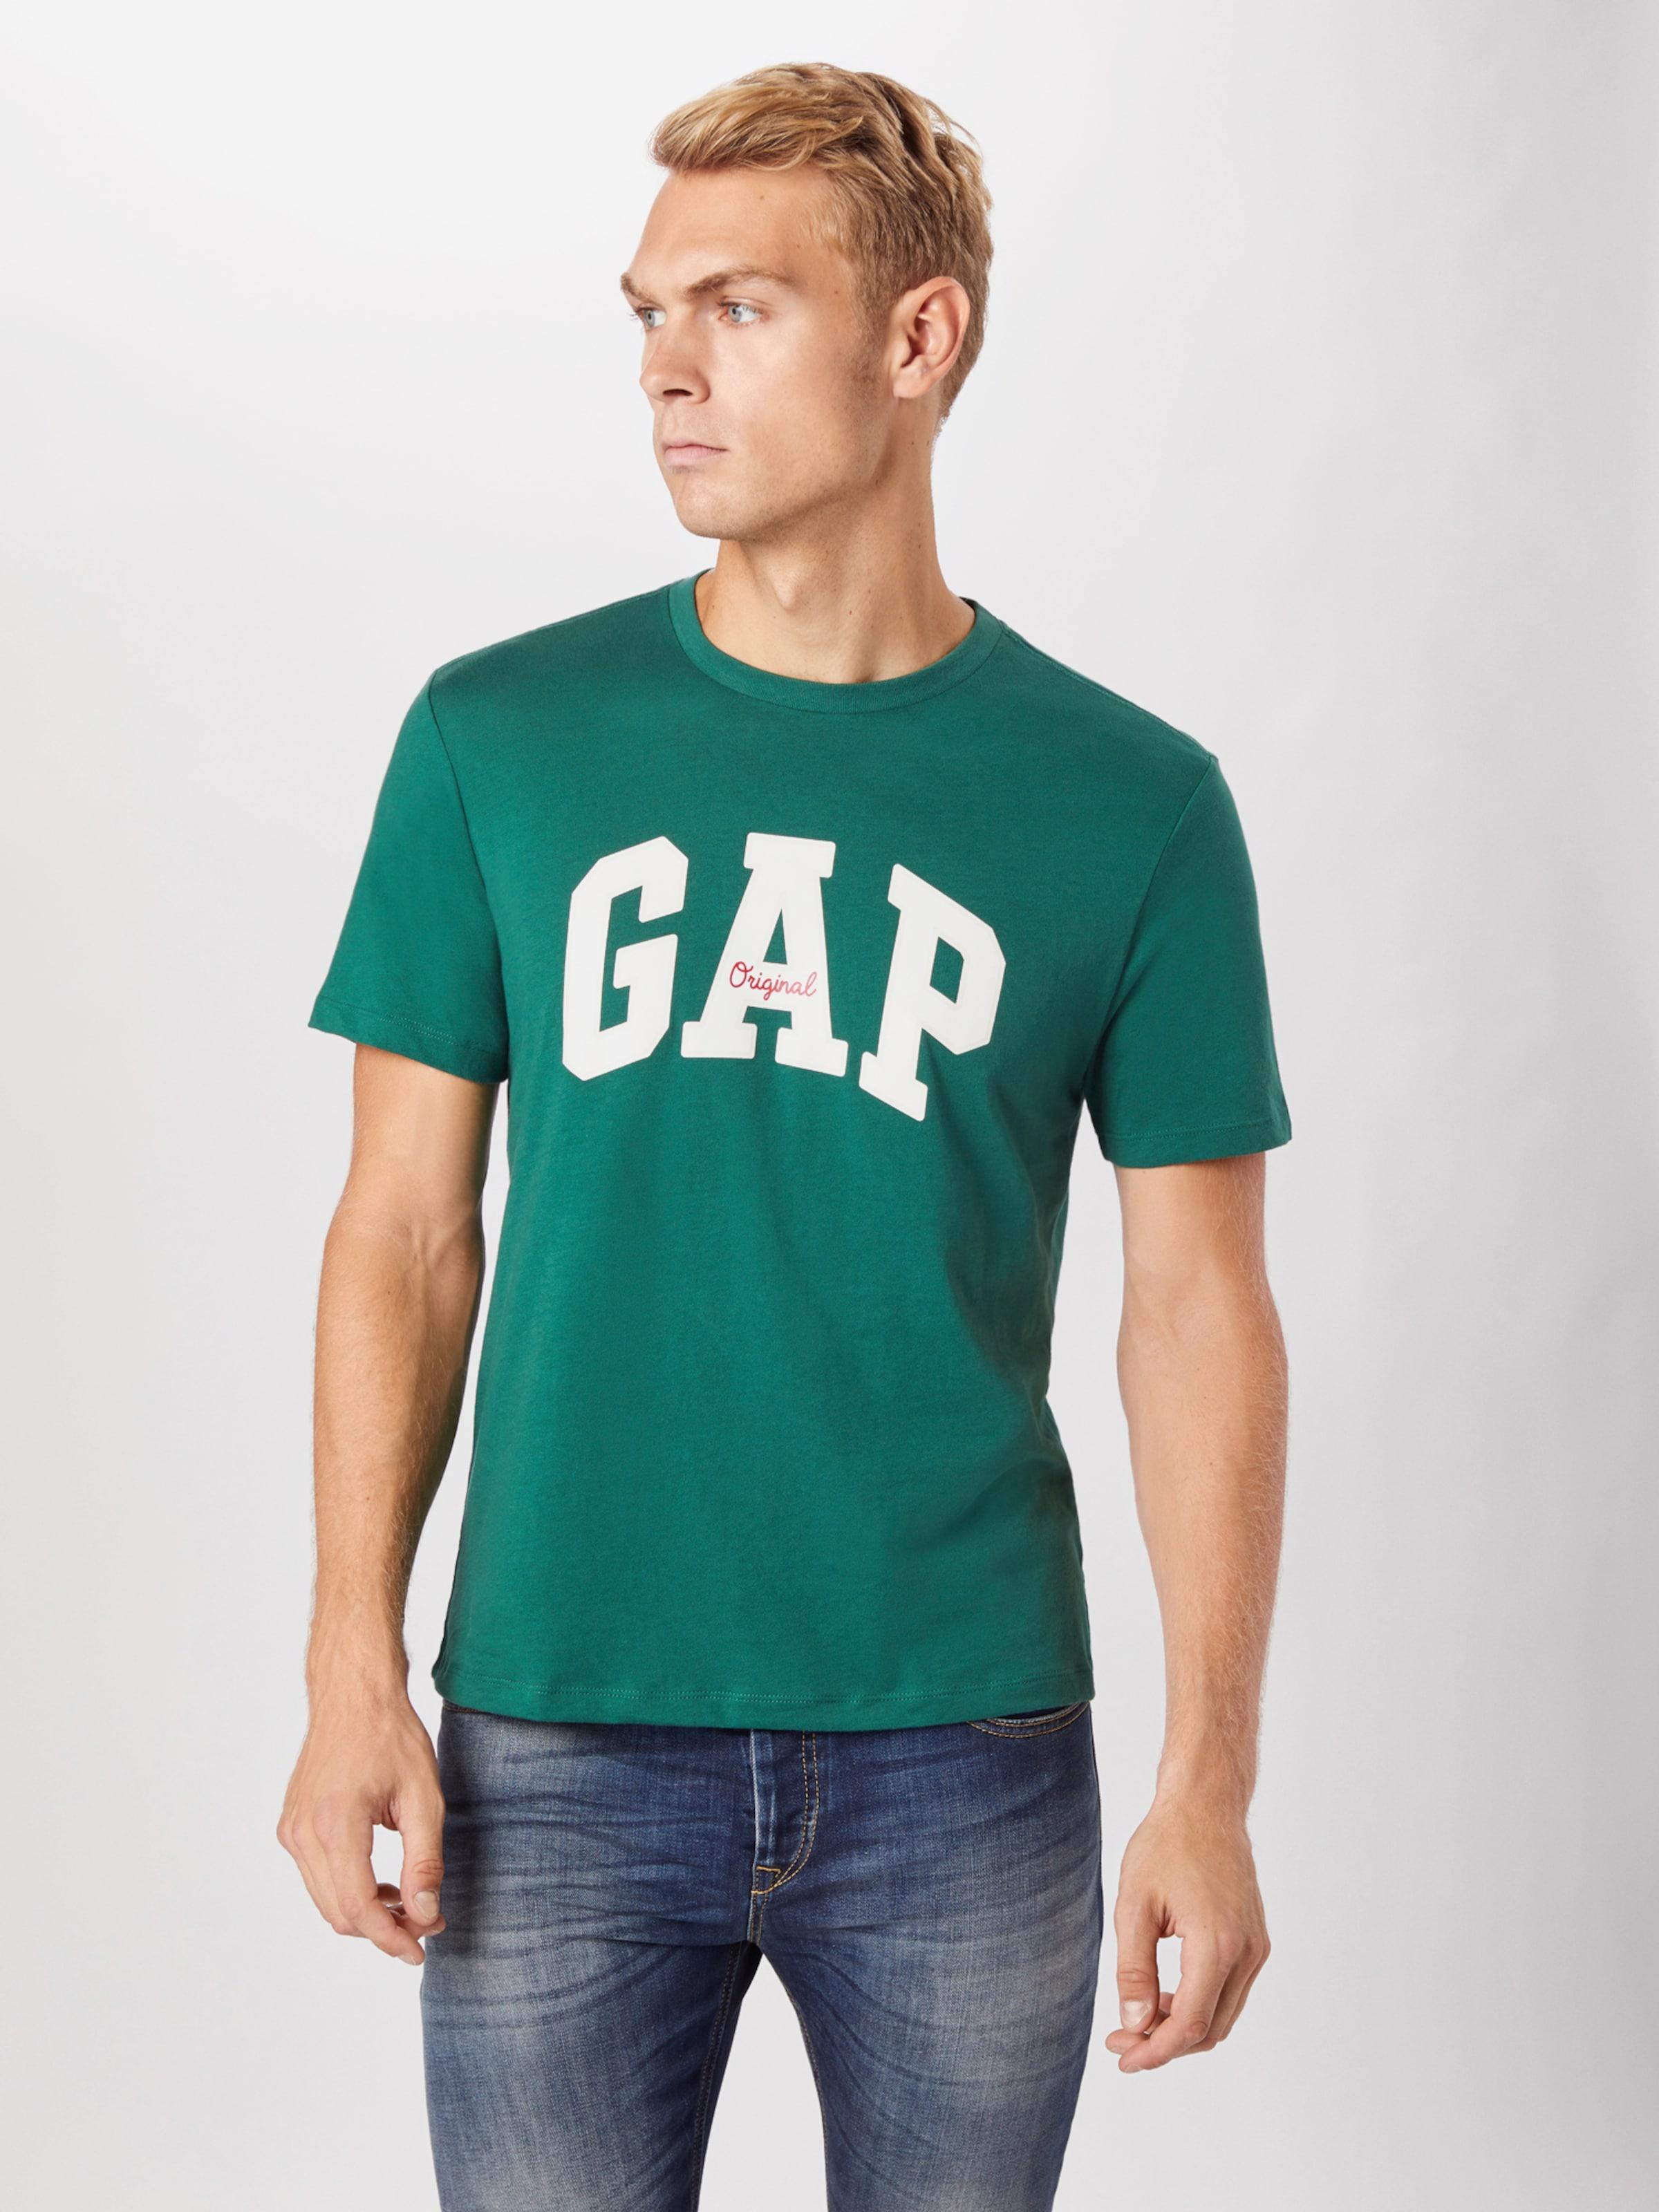 GAP T-Shirt in dunkelgrün / weiß Logoprint GAP3318007000001